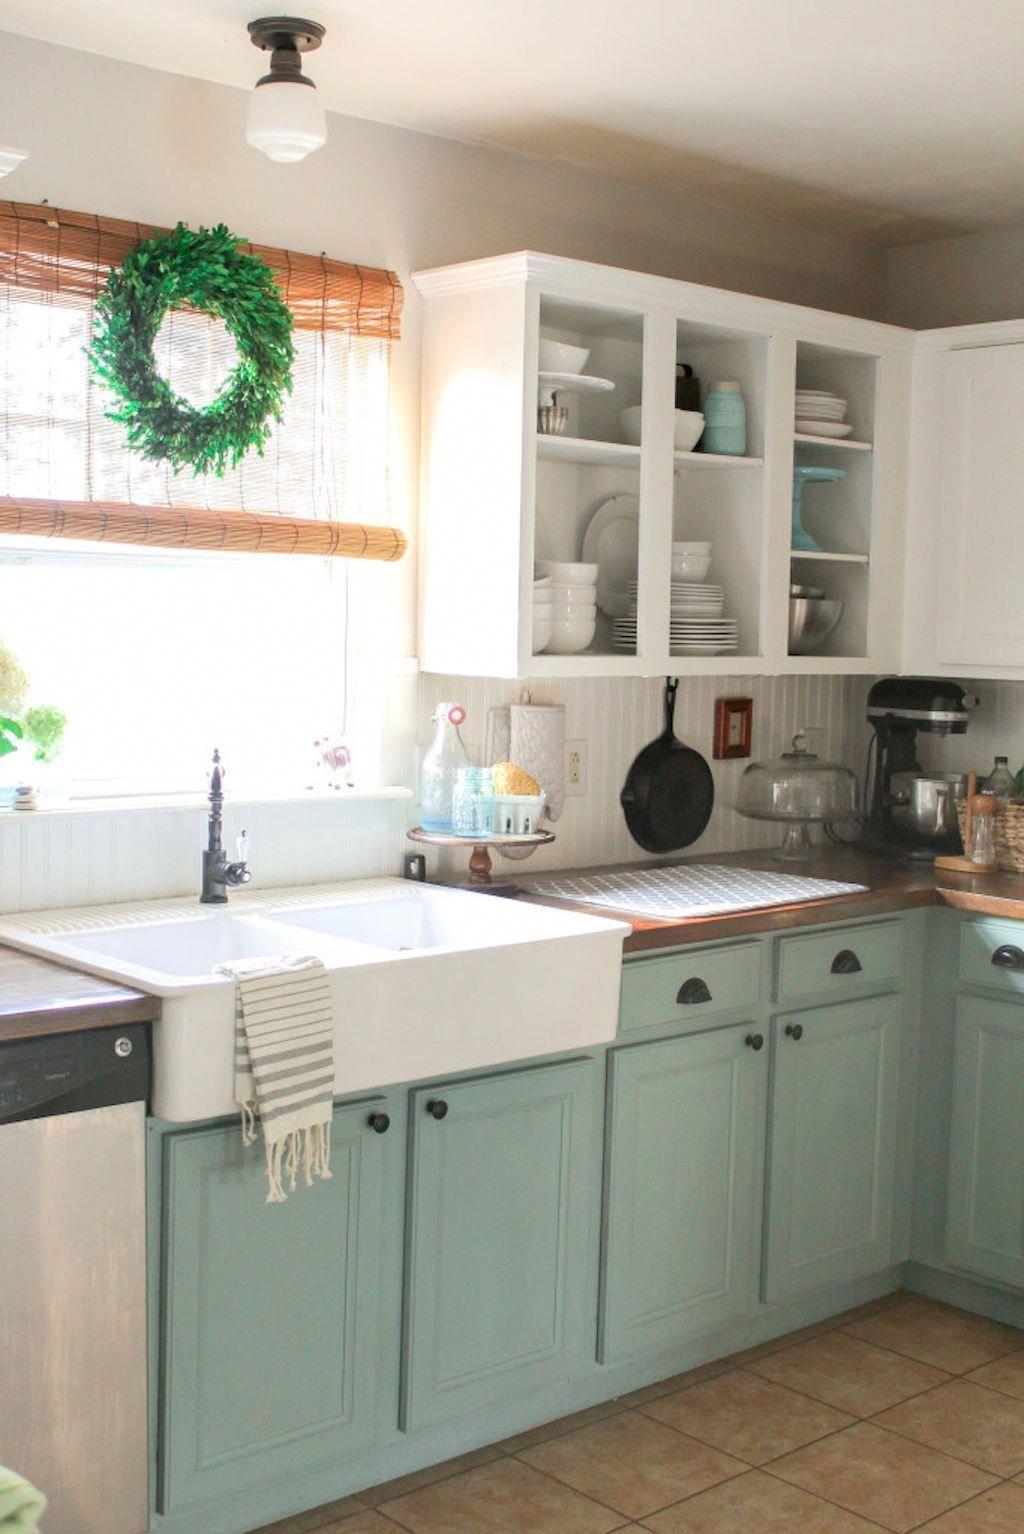 90 Best Farmhouse Kitchen Cabinet Design Ideas Crompton News Bluekitchencabinets In 2020 Kitchen Cabinets Decor Mobile Home Kitchen Cabinets Redo Kitchen Cabinets